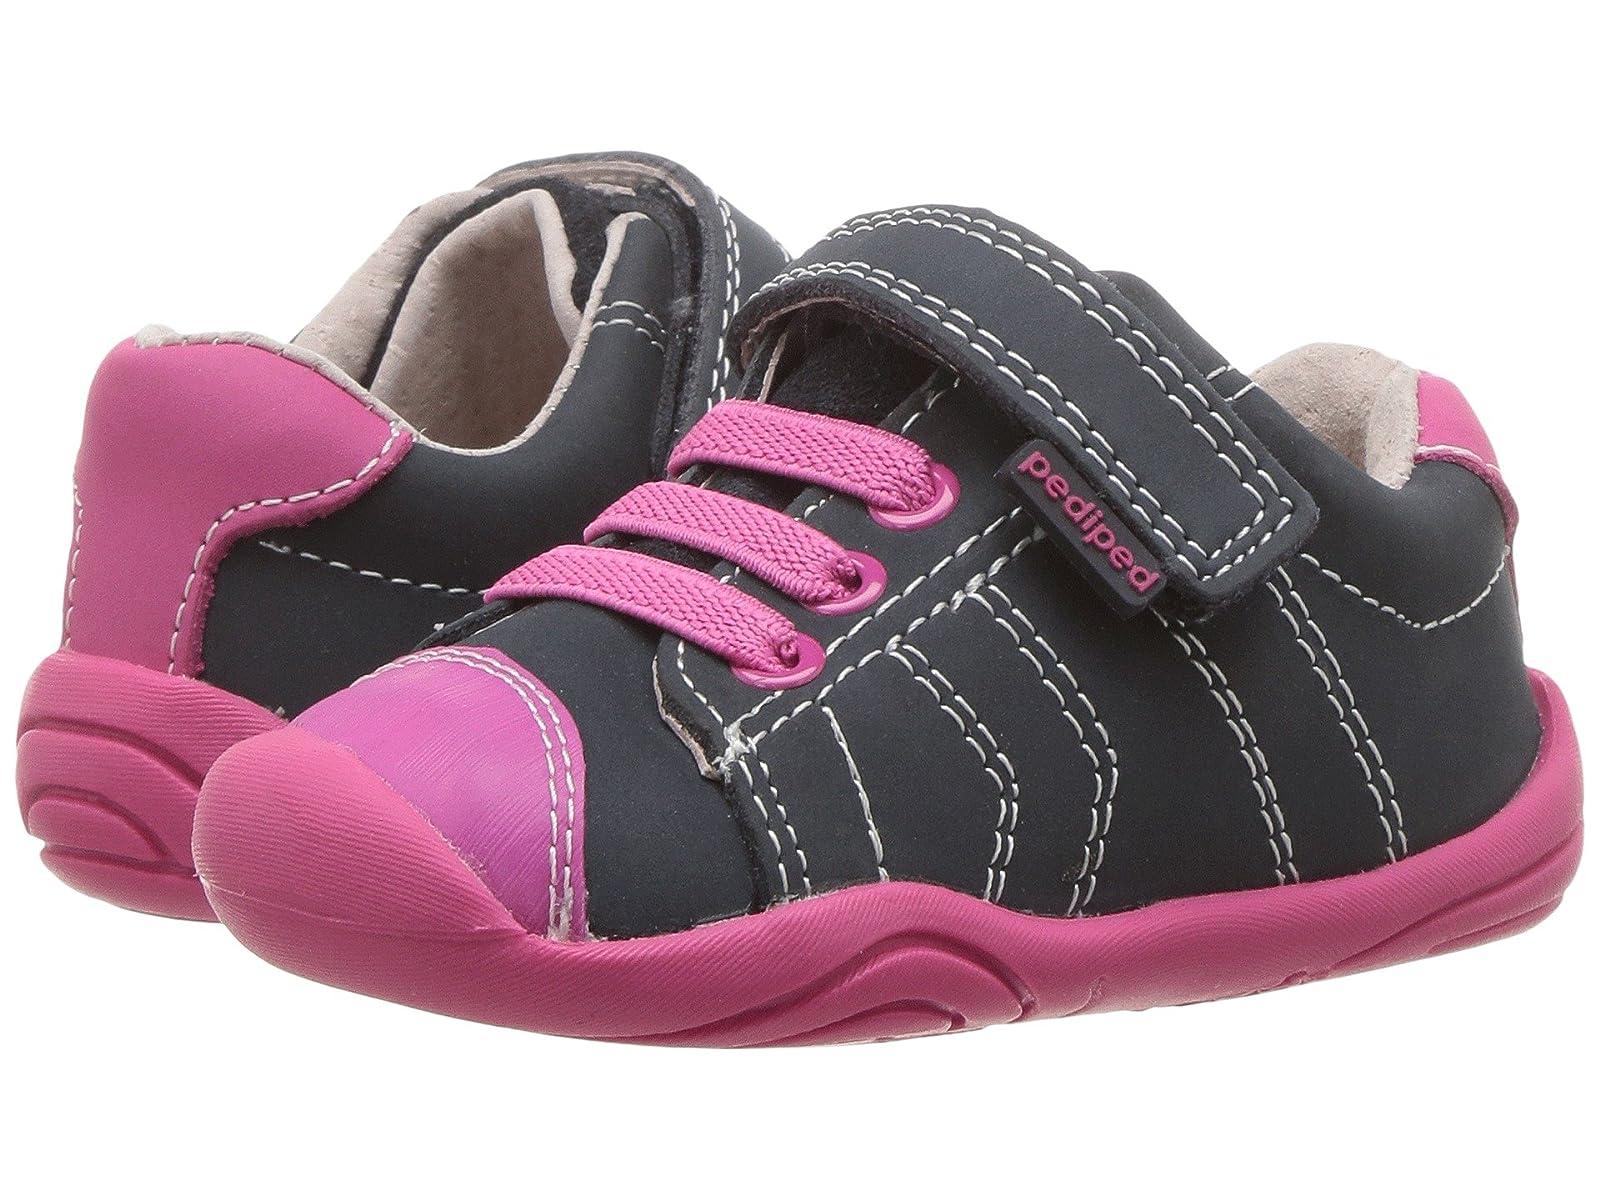 pediped Jake Grip n Go (Toddler)Atmospheric grades have affordable shoes